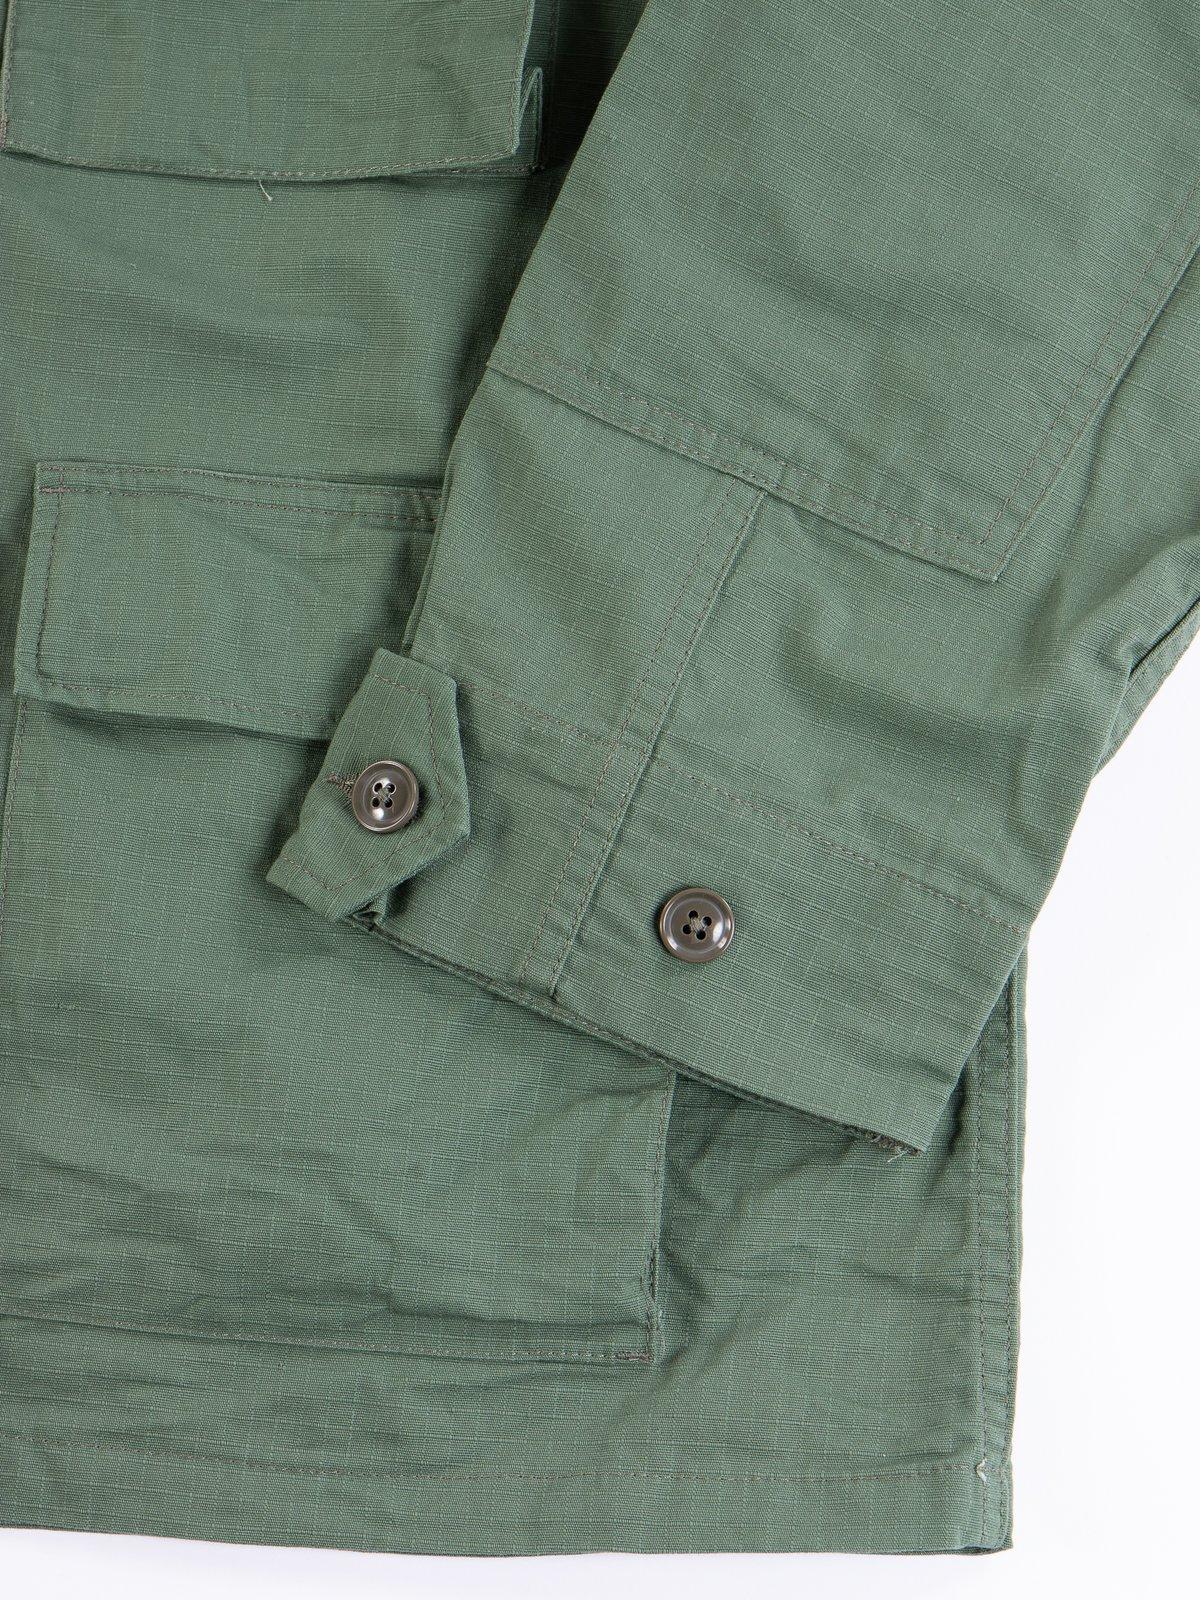 Olive Cotton Ripstop BDU Jacket - Image 4